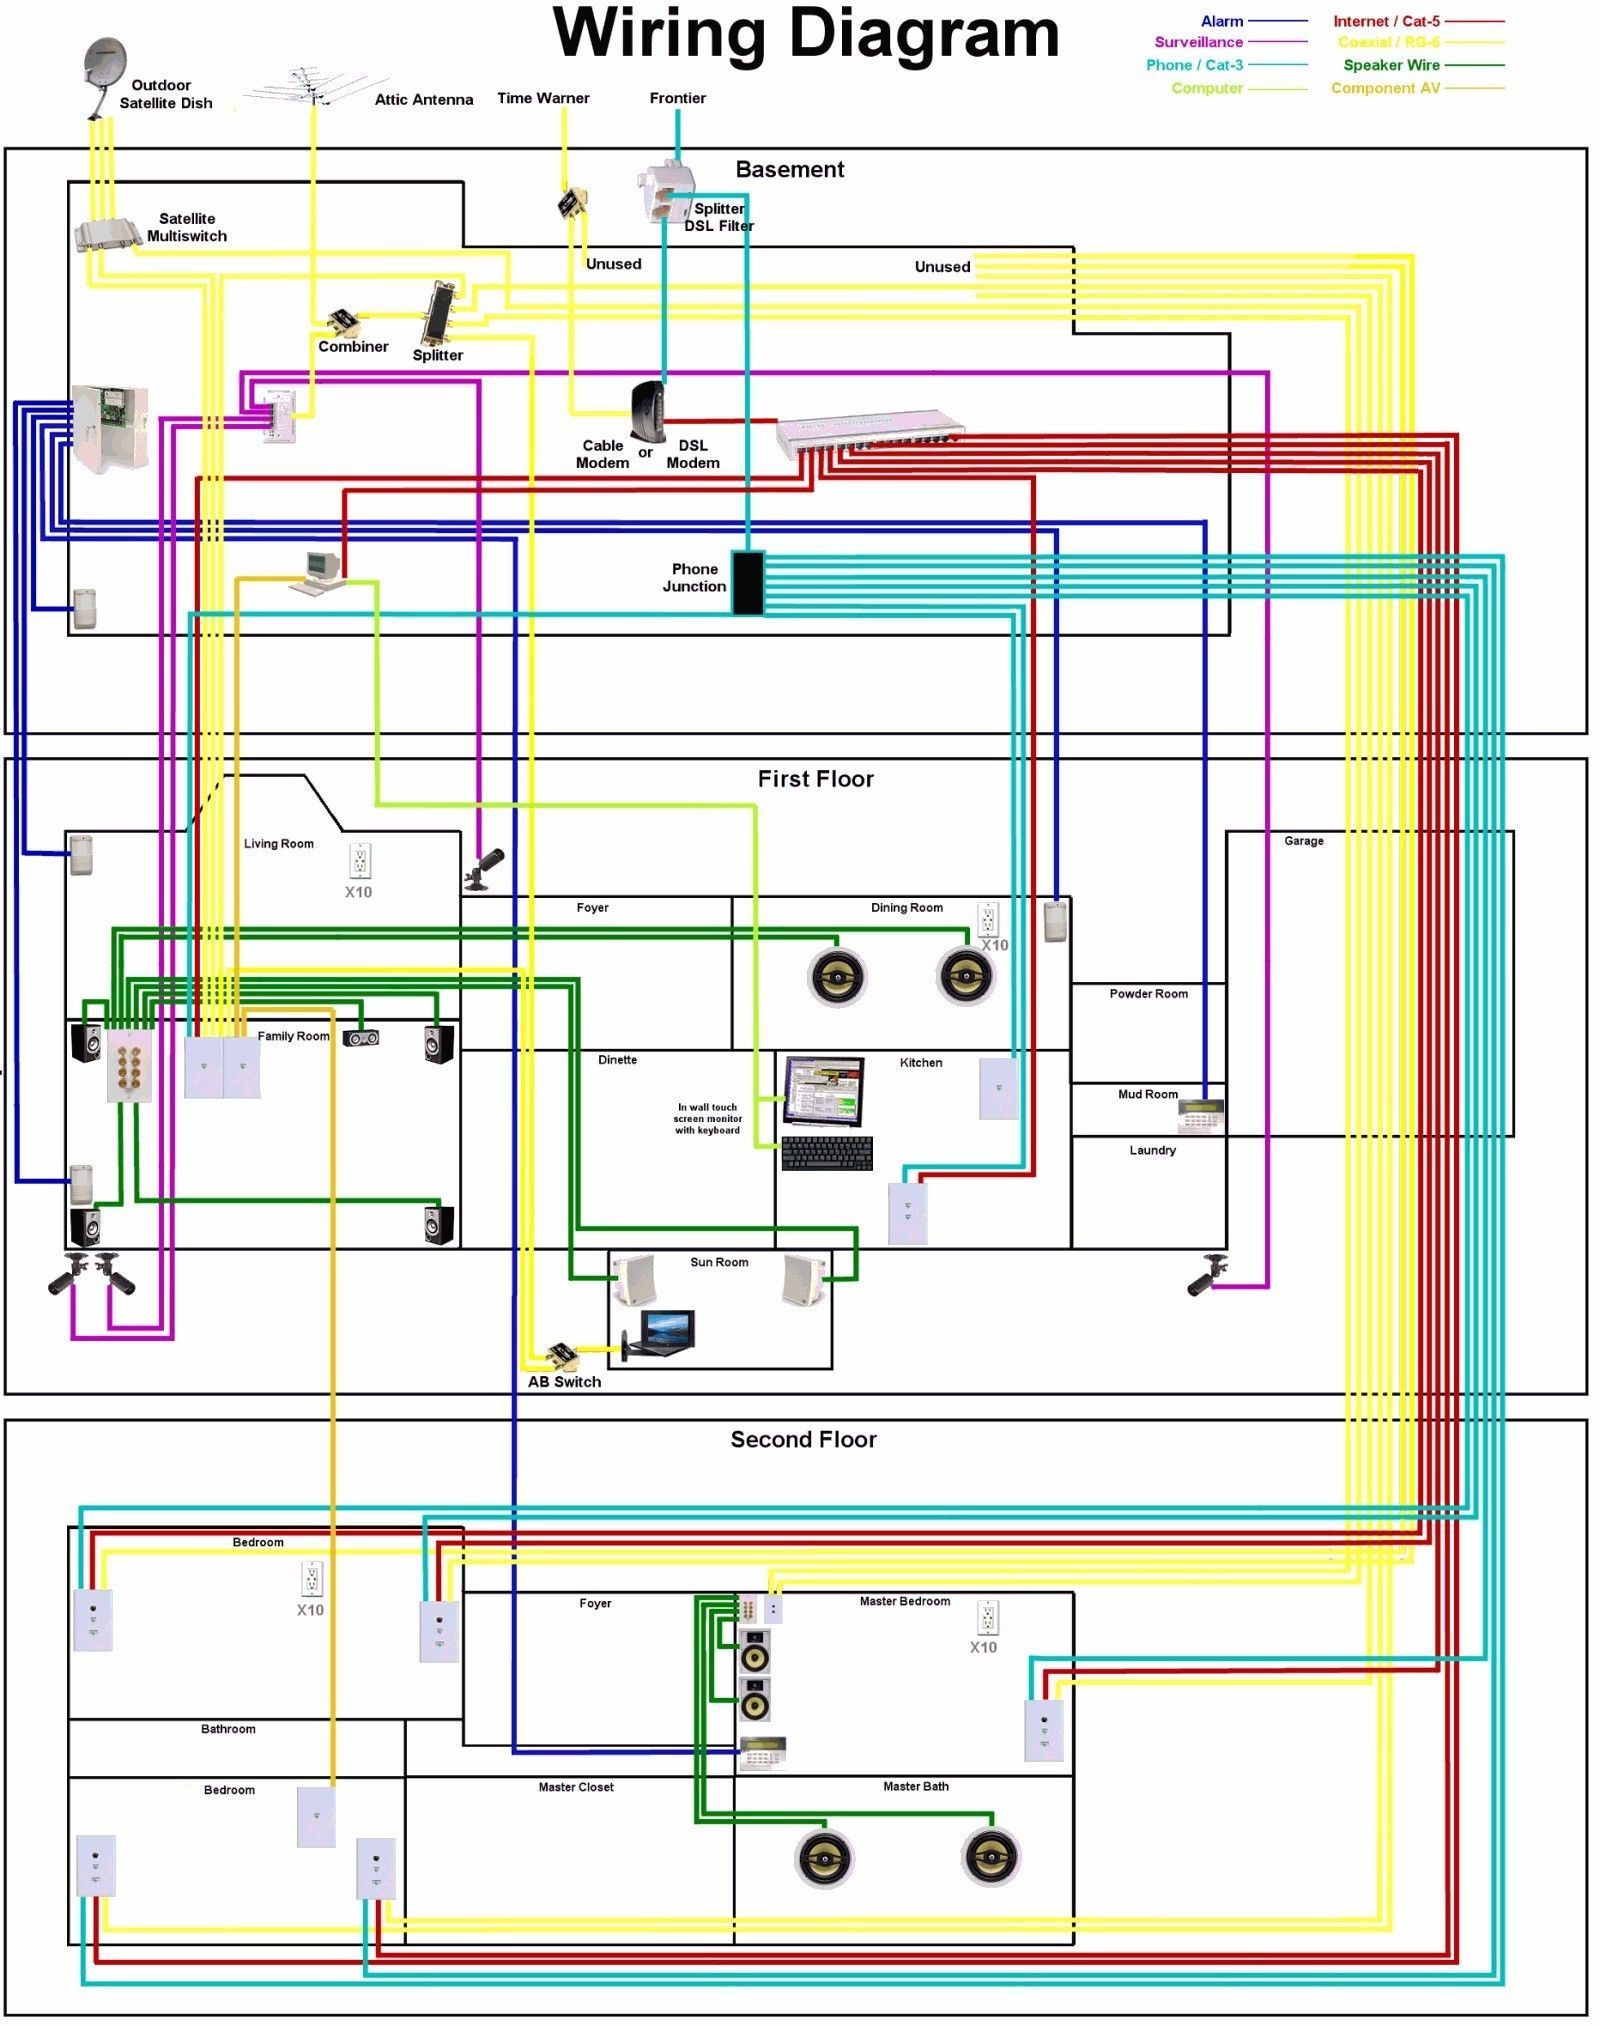 wiring diagram software 20 electrical wiring diagram software design  with images  home wiring diagram software mac 20 electrical wiring diagram software